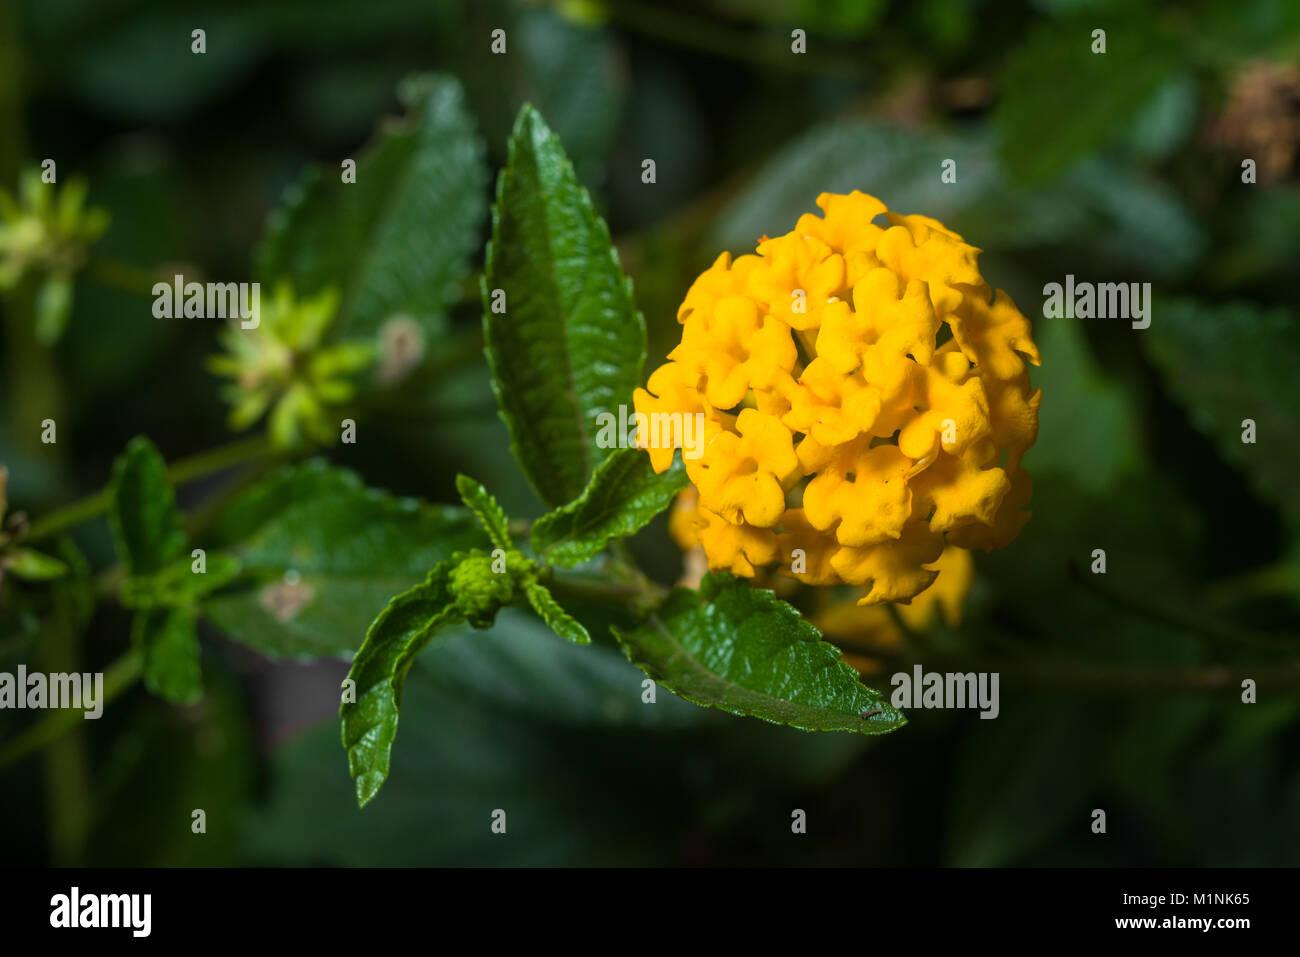 Lantana camara plant showing orange yellow flowers and leaves, Nairobi, Kenya, East Africa Stock Photo